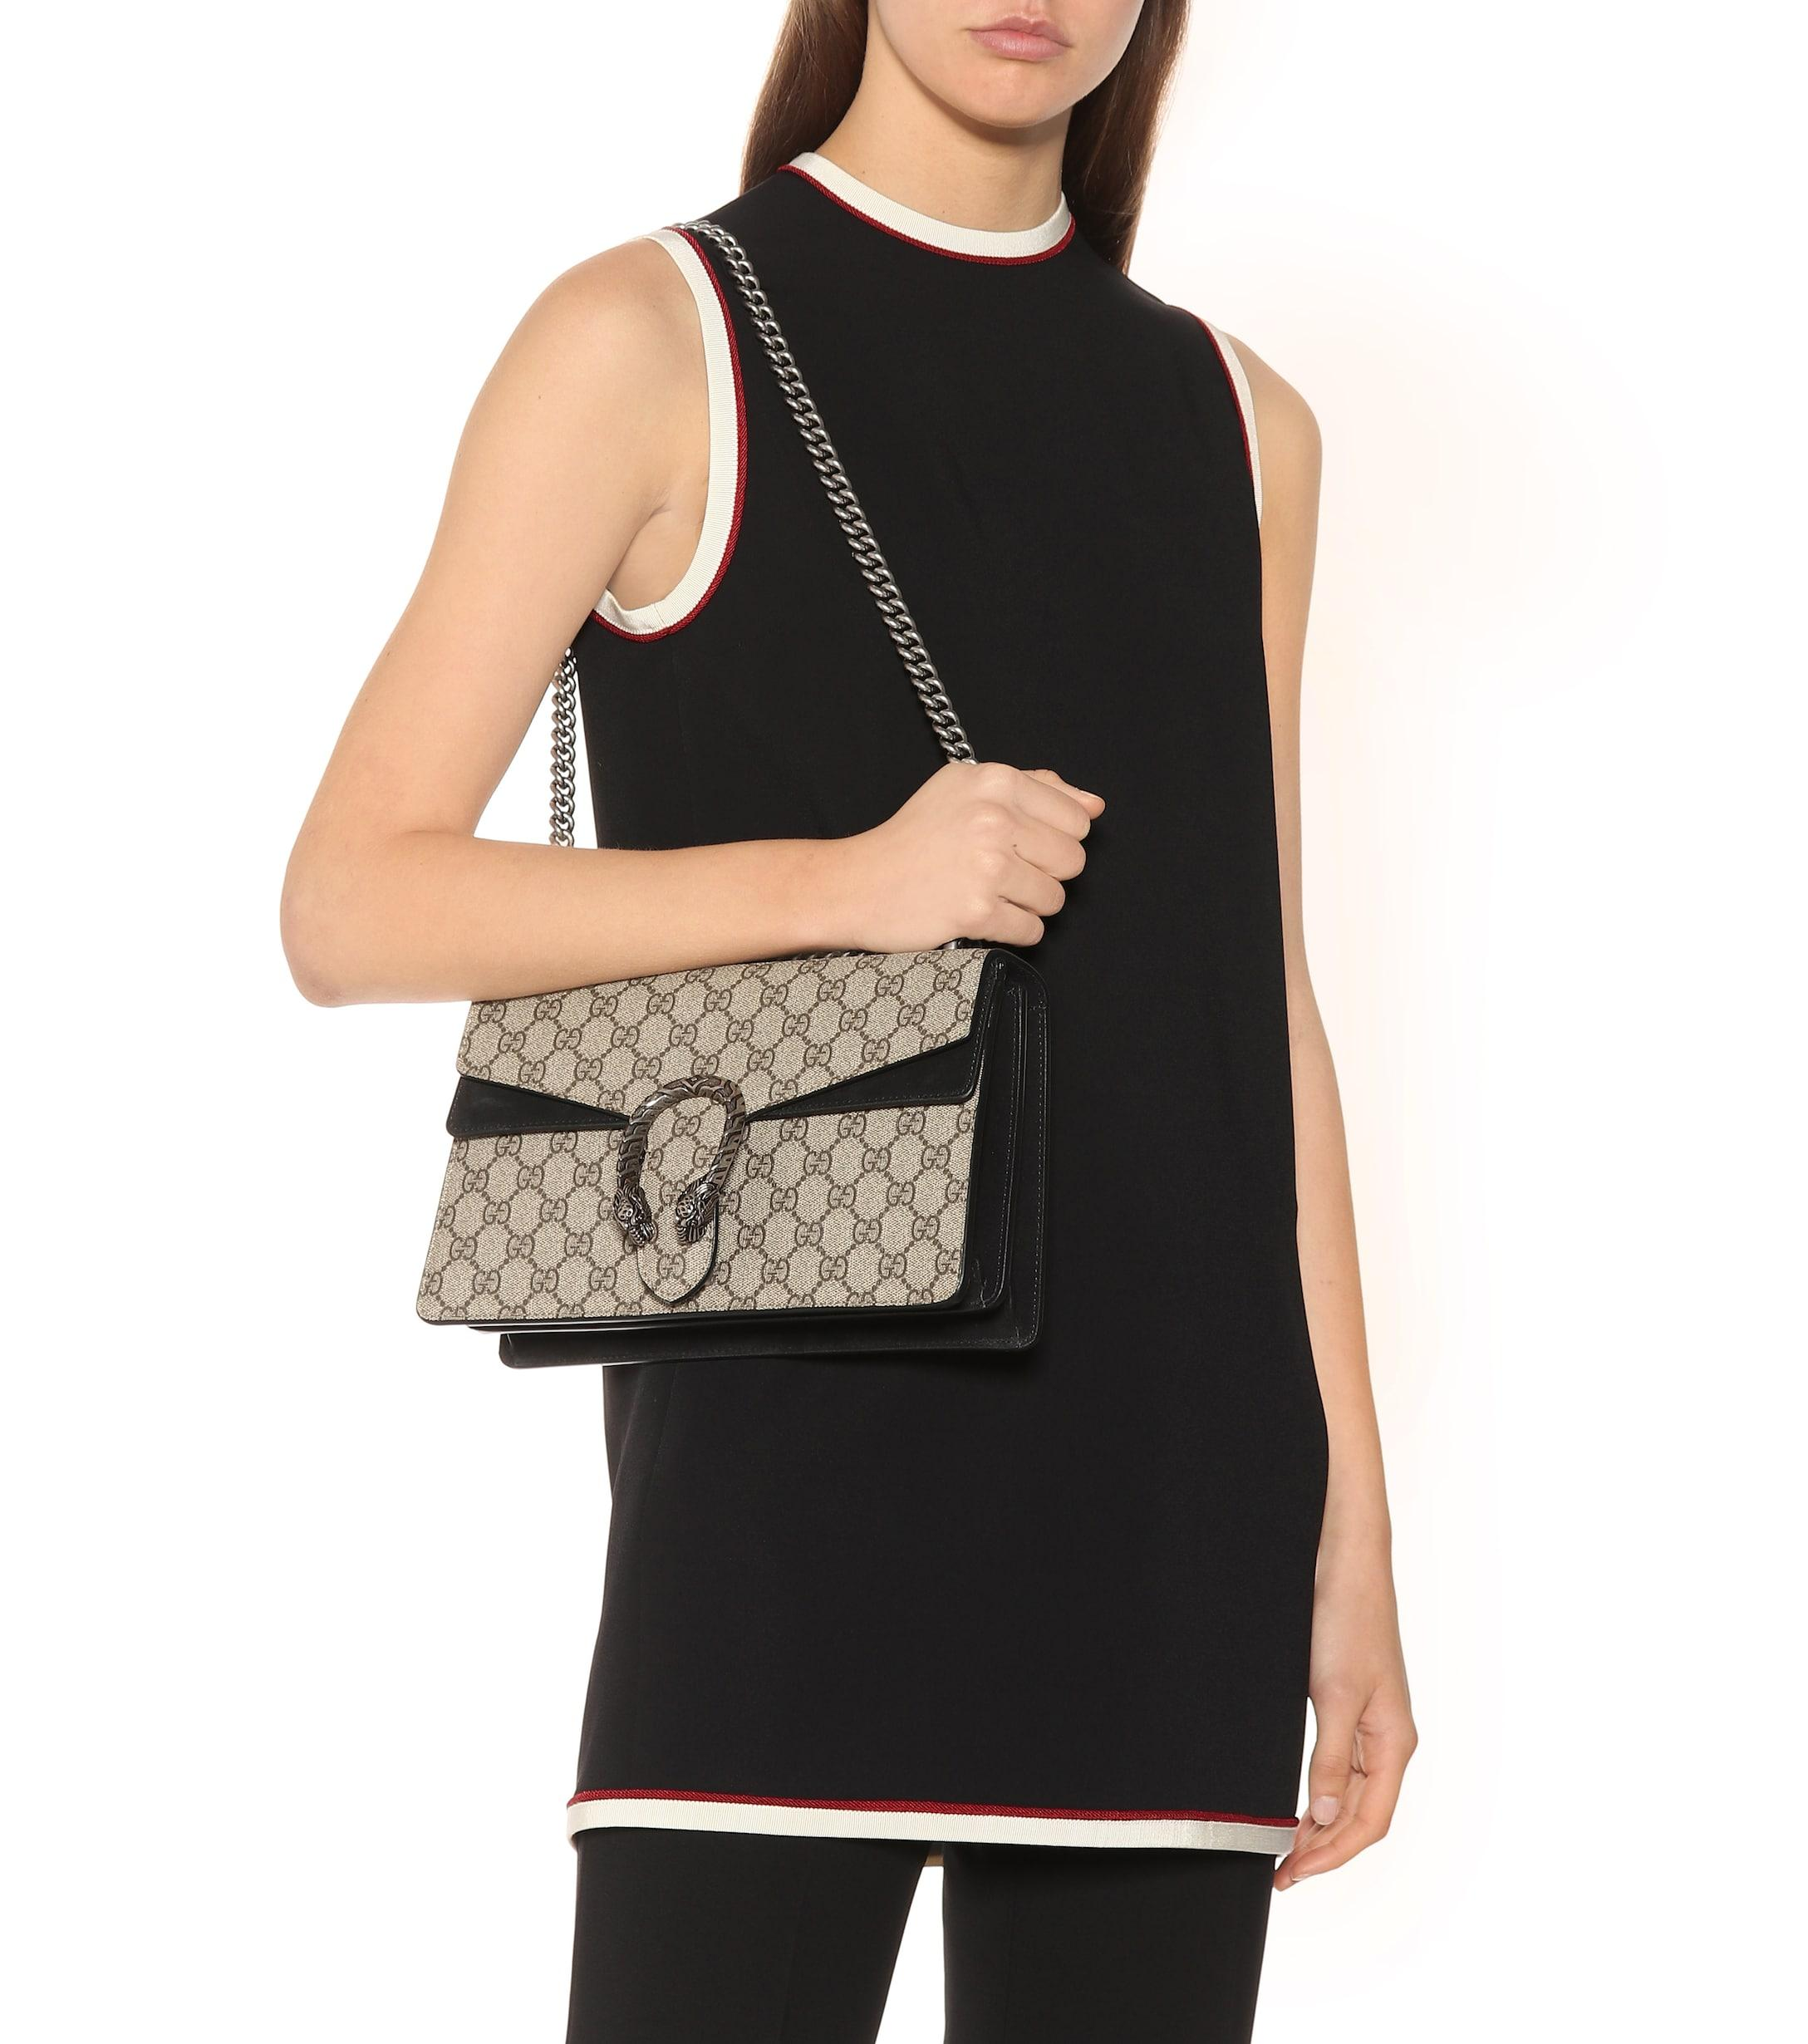 1ebe13bc5ebe Gucci - Natural Dionysus GG Supreme Small Shoulder Bag - Lyst. View  fullscreen